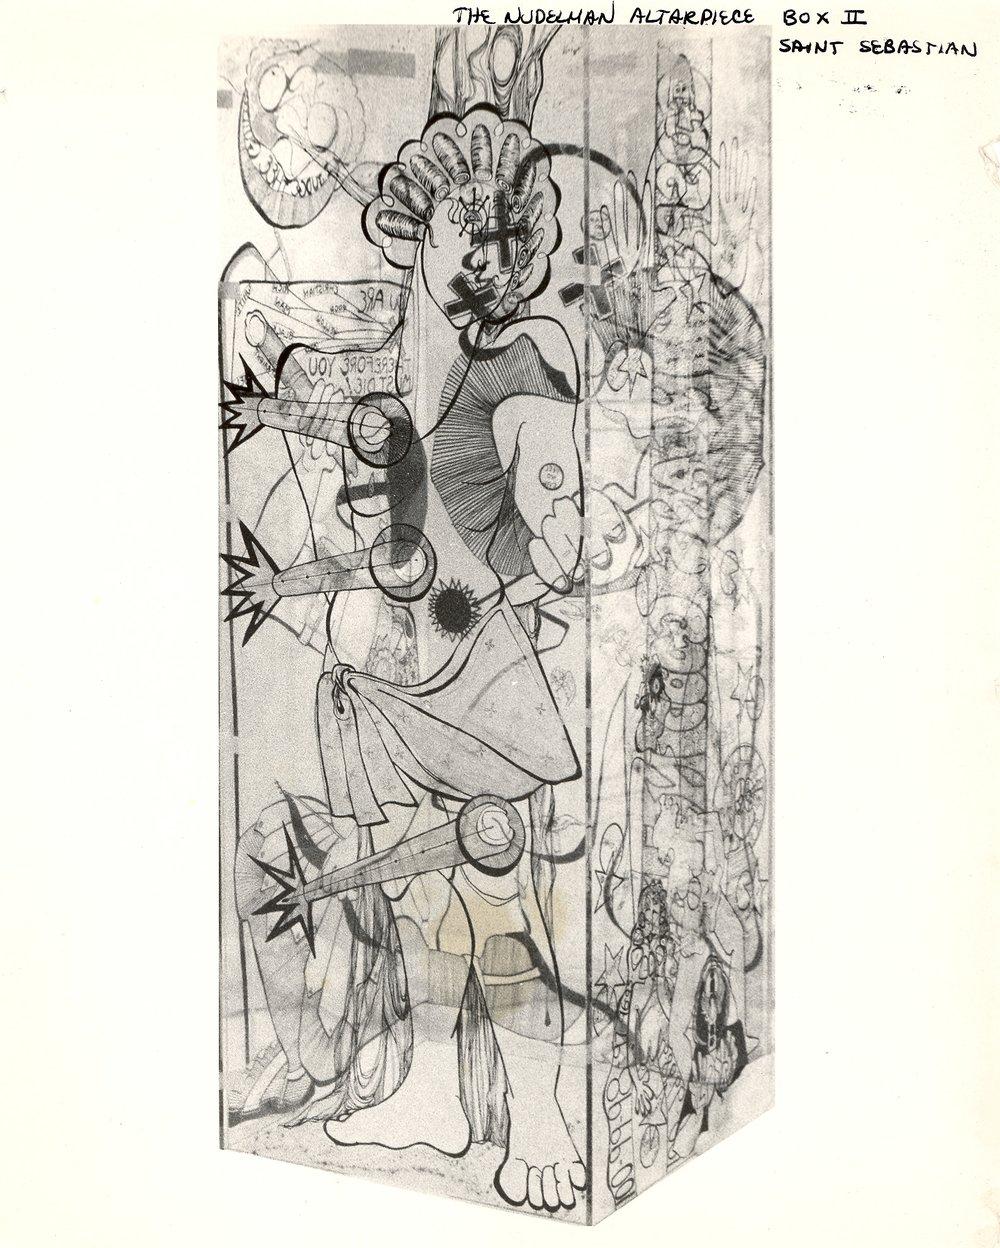 Nudelman Altarpiece - Box II - All Panels.jpg